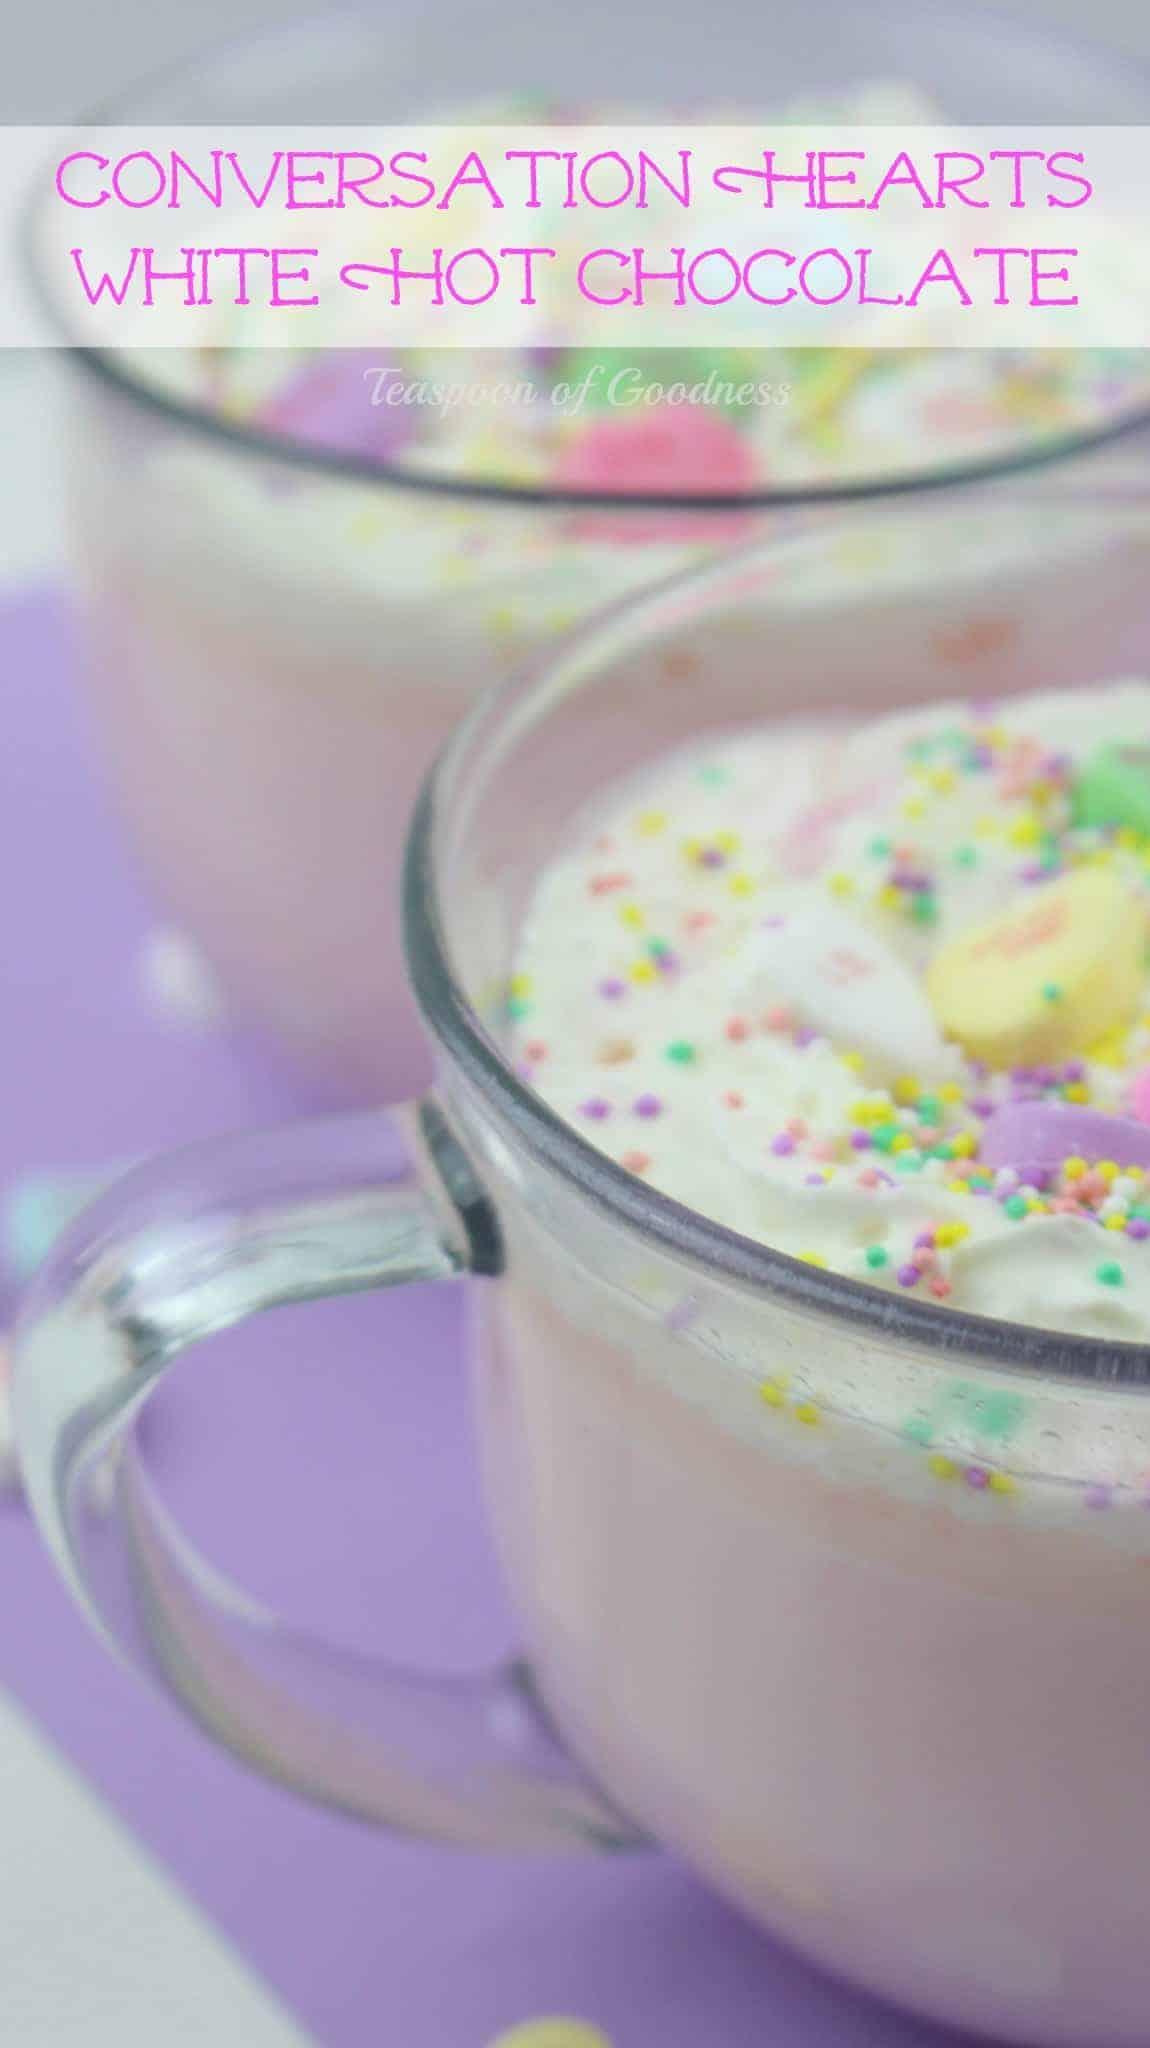 Conversation Hearts Hot Chocolate Recipe